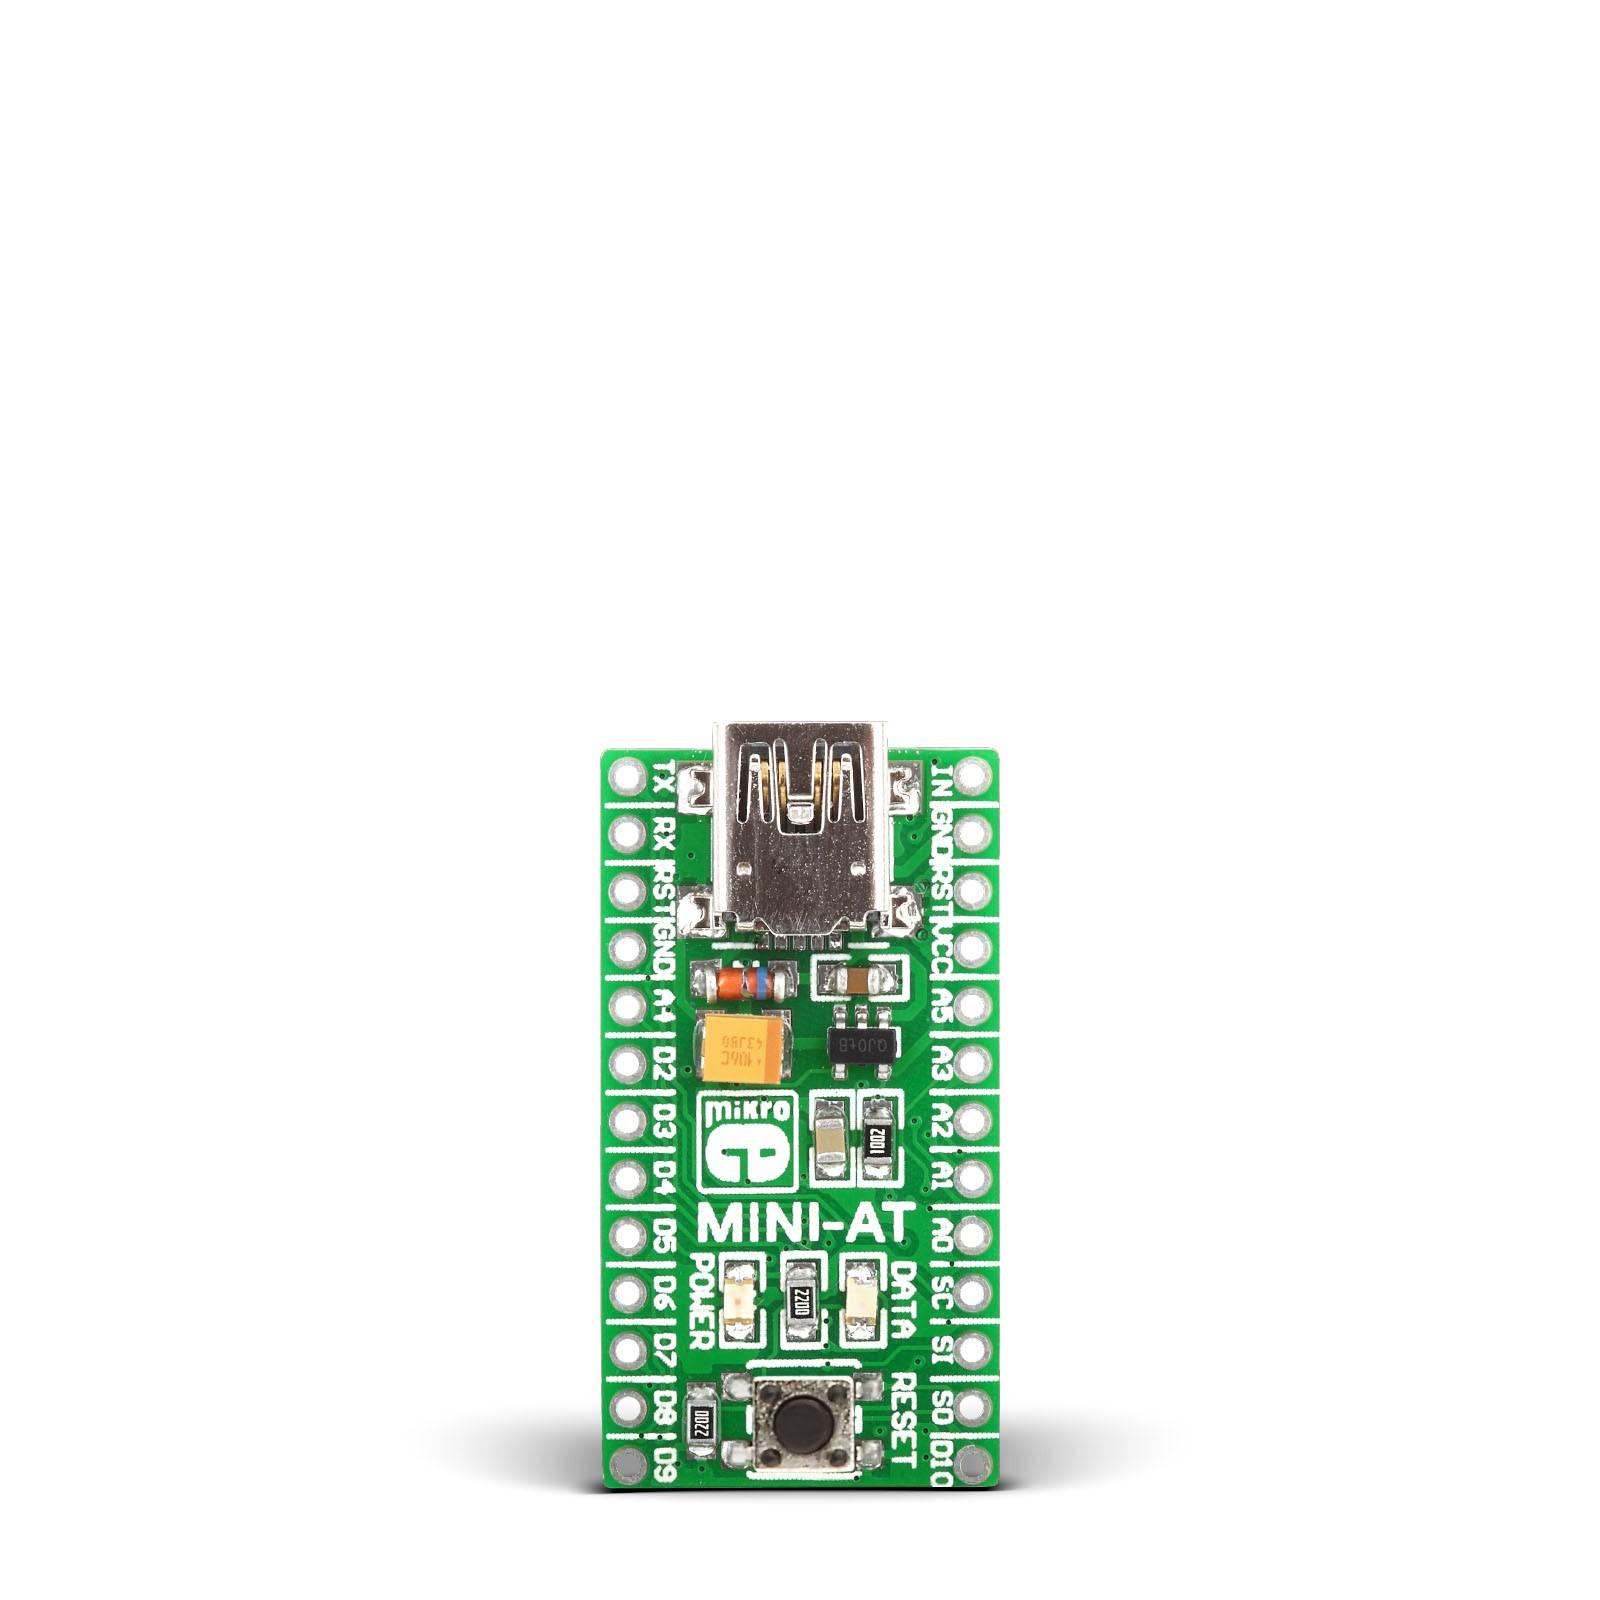 Mini At Avr Usb Development Board In Dip26 Form Factor Programmer Electronic Device Mgctlbxnmzp Mgctlbxv5112 Mgctlbxlc Mgctlbxpprestashop